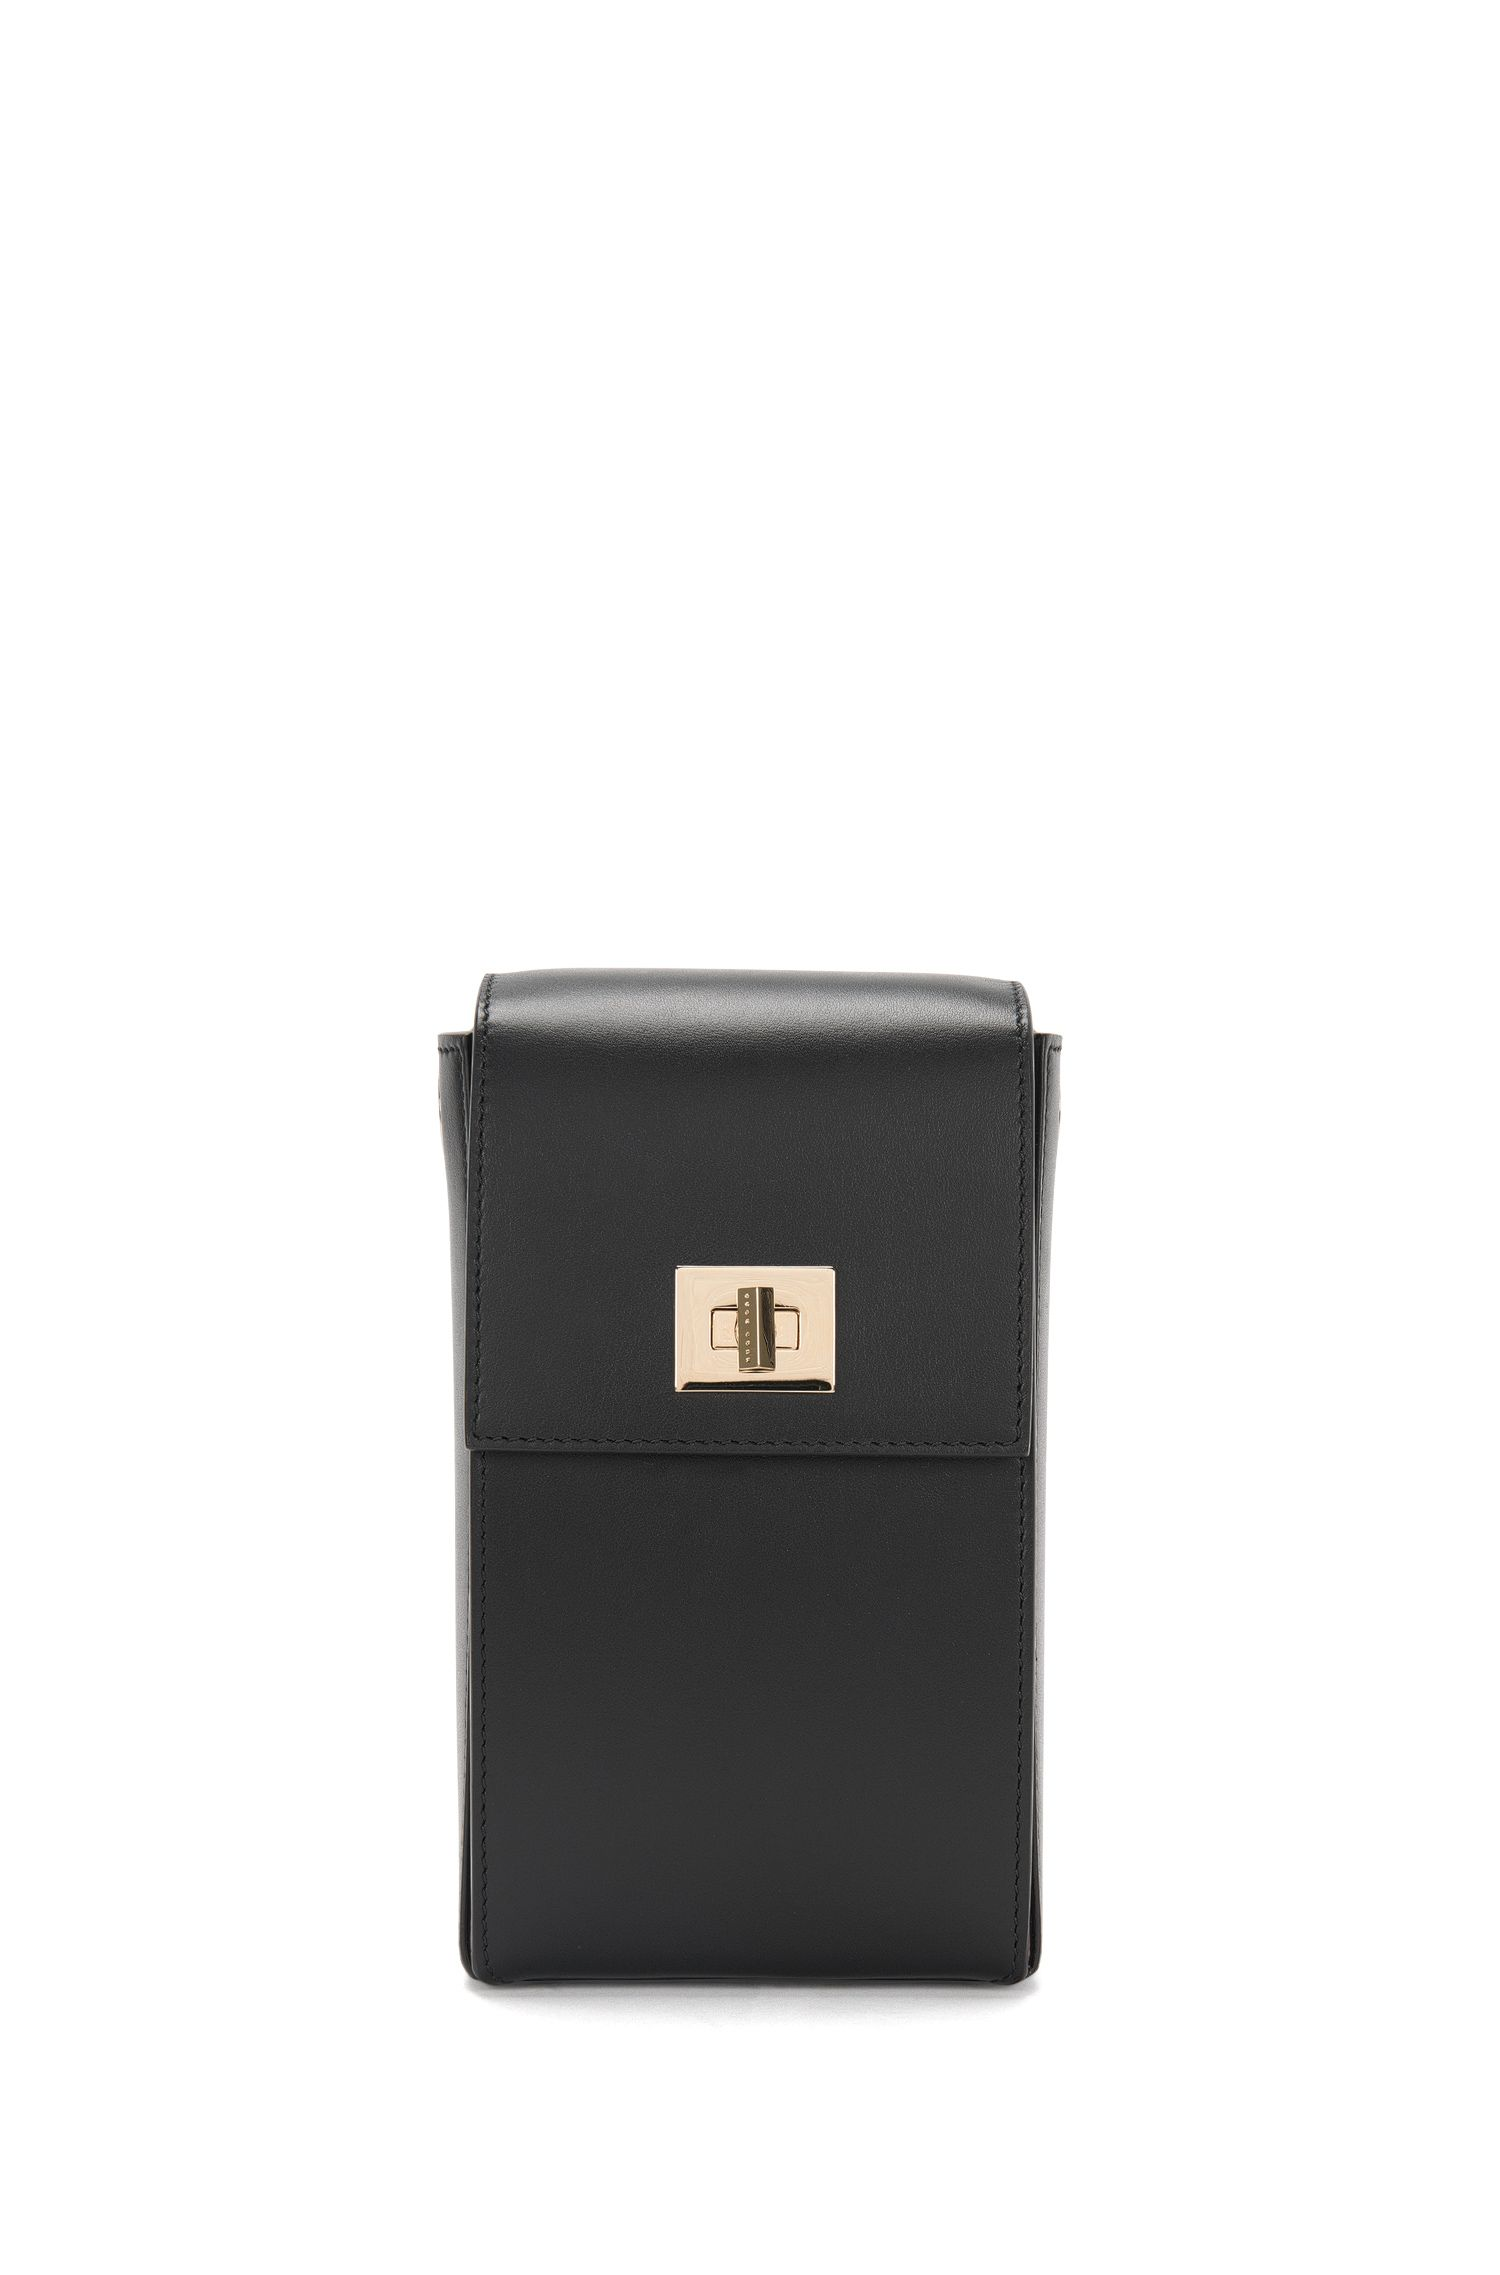 BOSS Bespoke shoulder bag in smooth leather